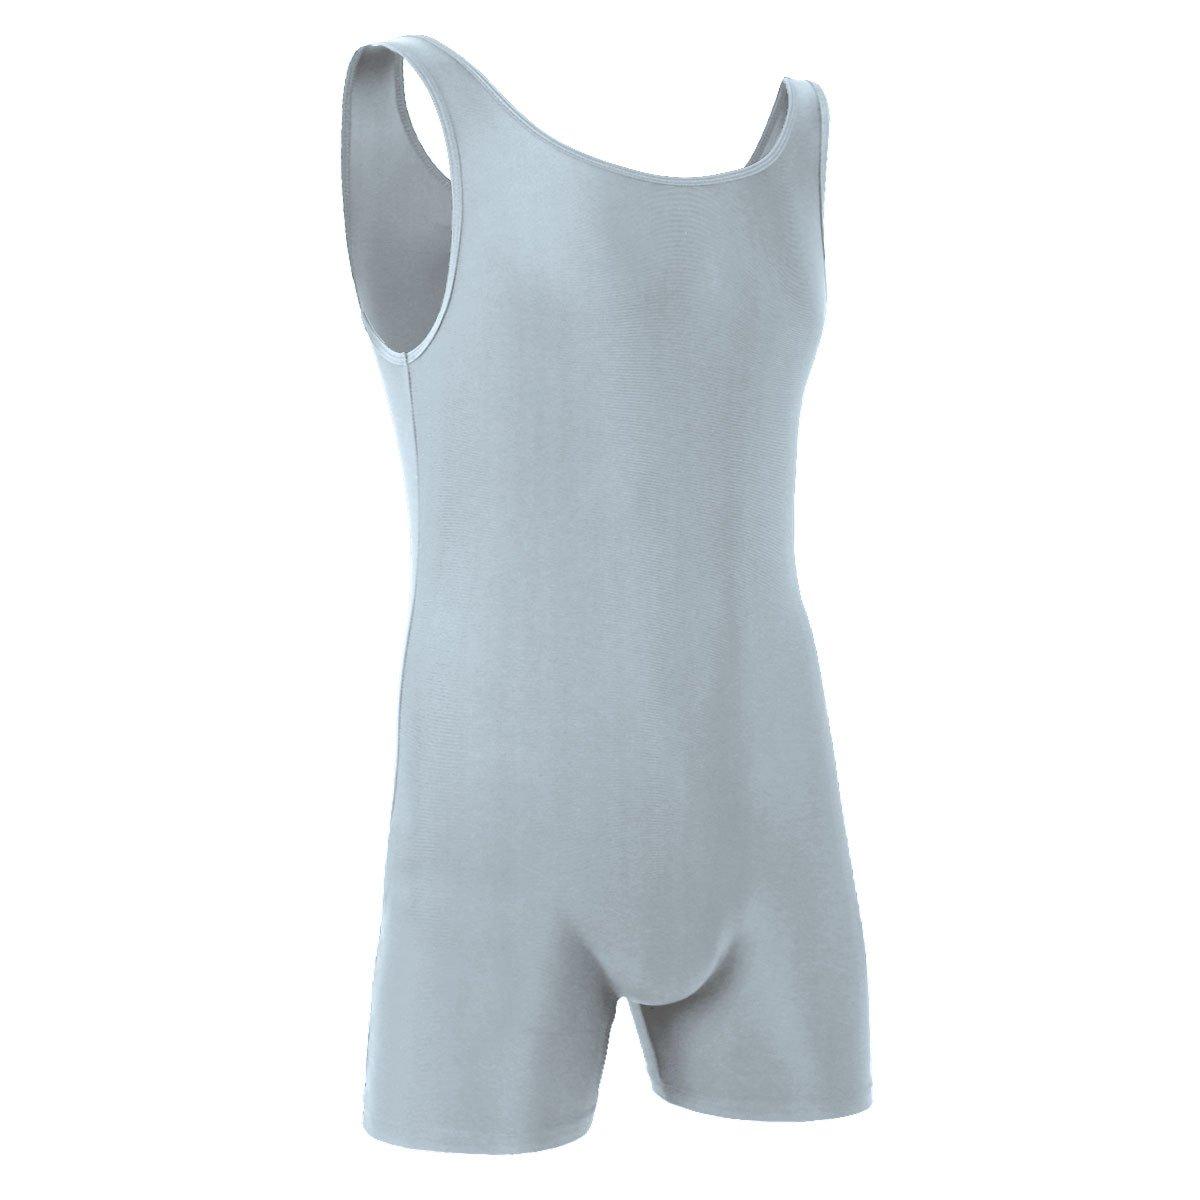 Freebily Men's One-Piece Boxers Leotard Soft Bodysuit Shorts Stretch Underwear Sportswear Jumpsuit